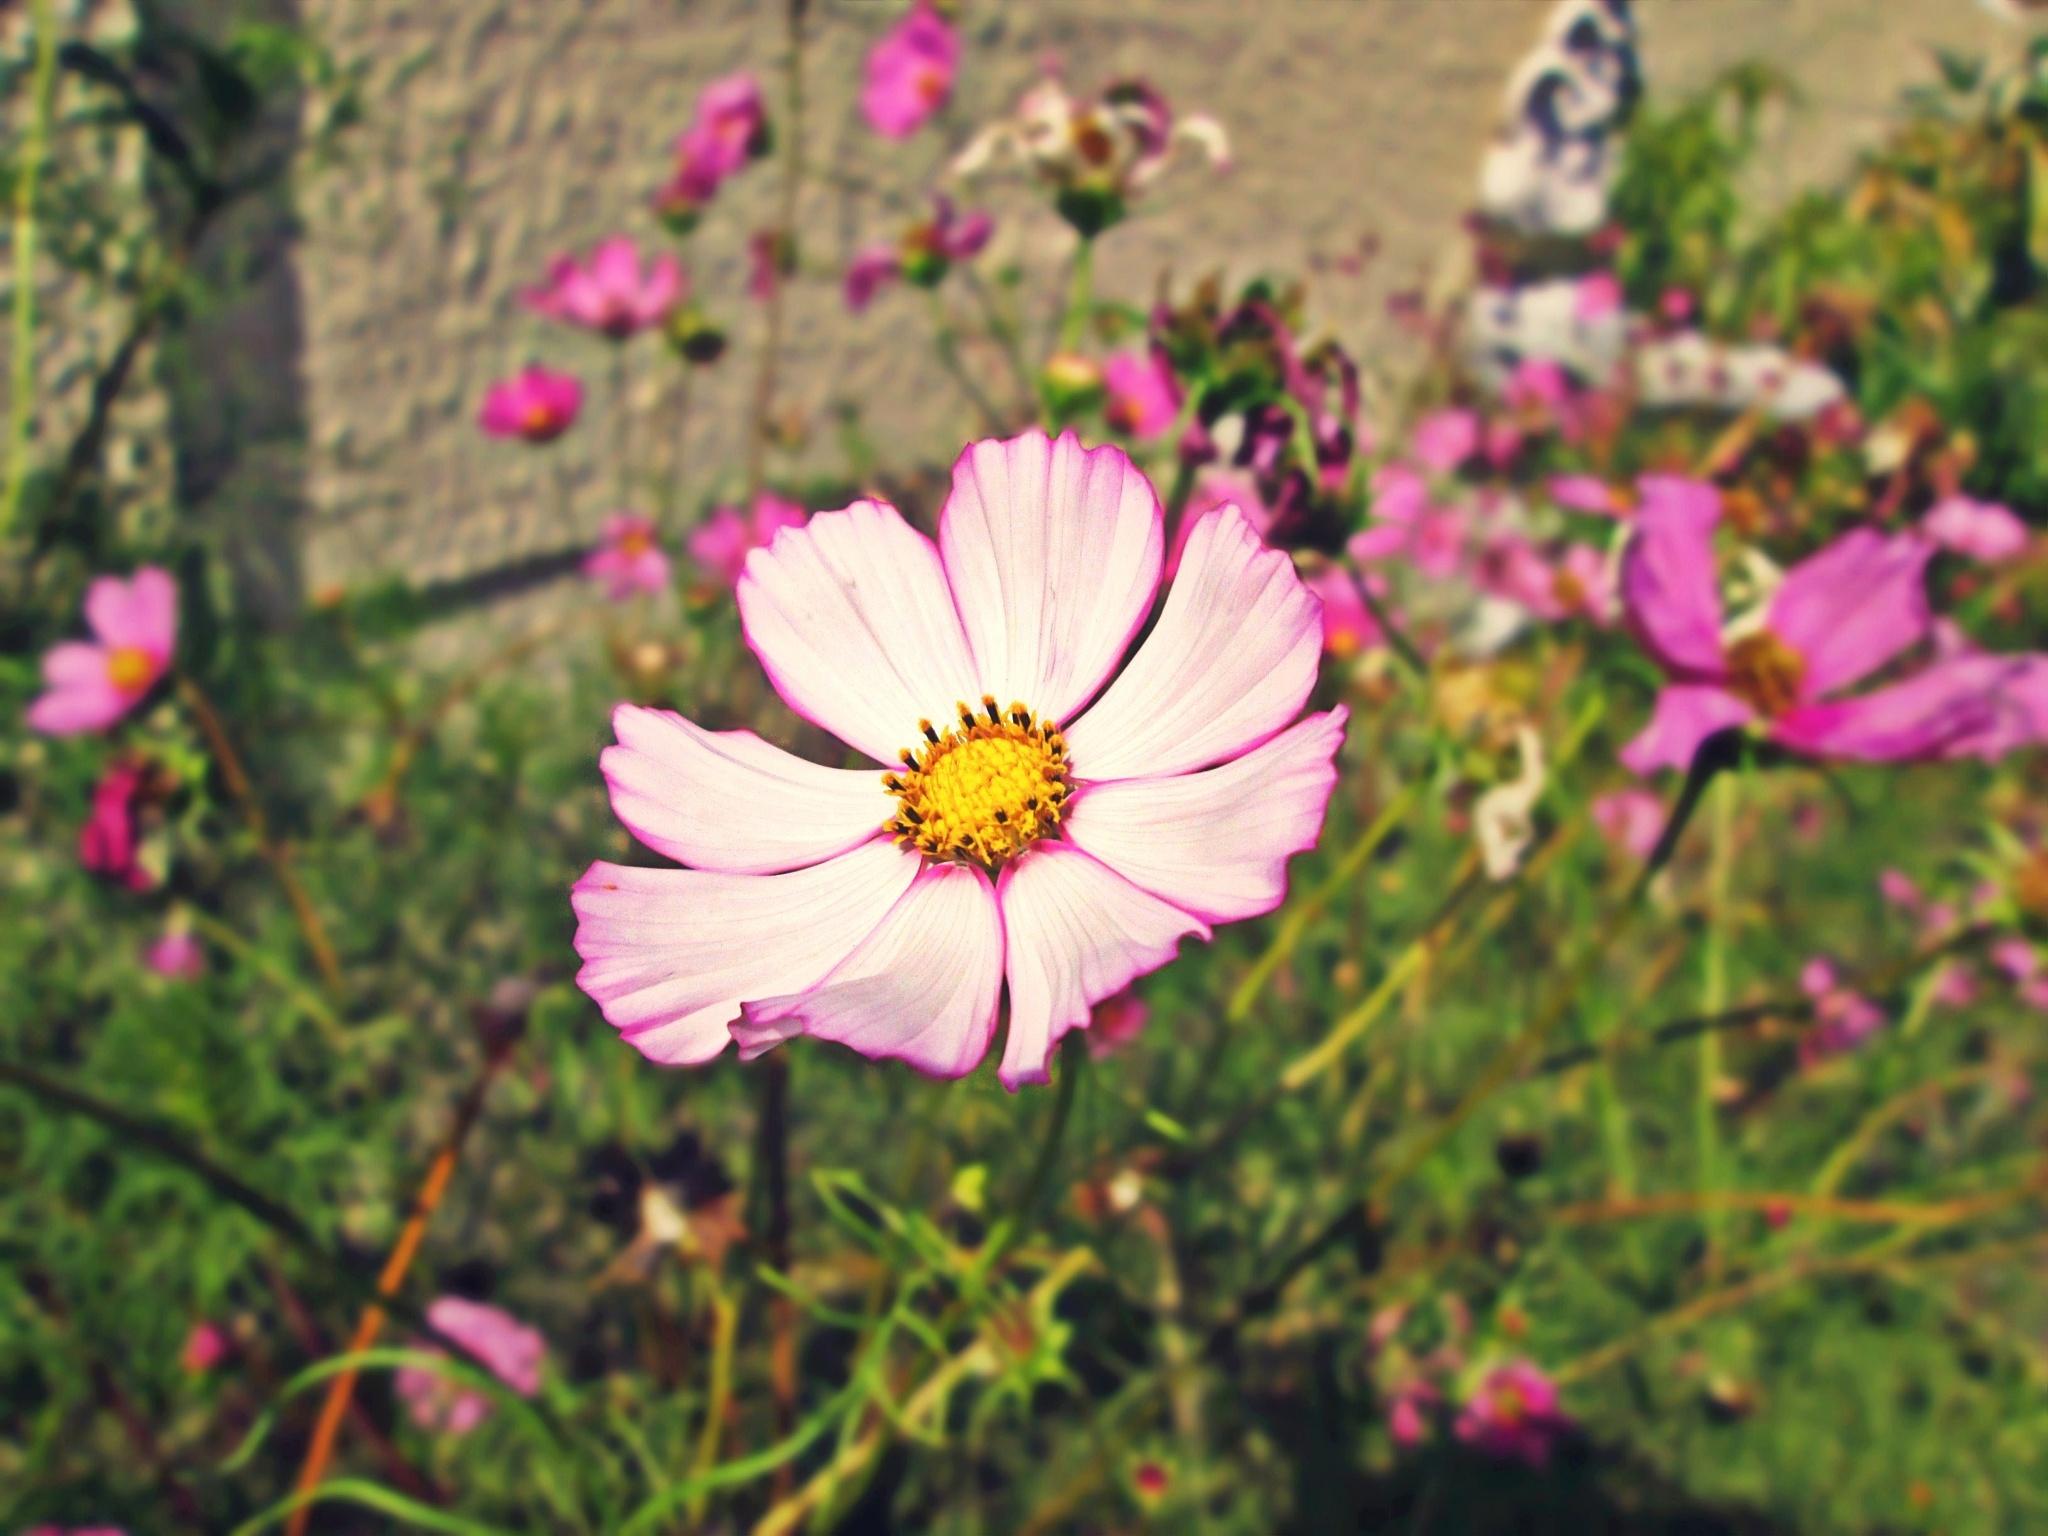 Cosmos Flower by Kate Blake